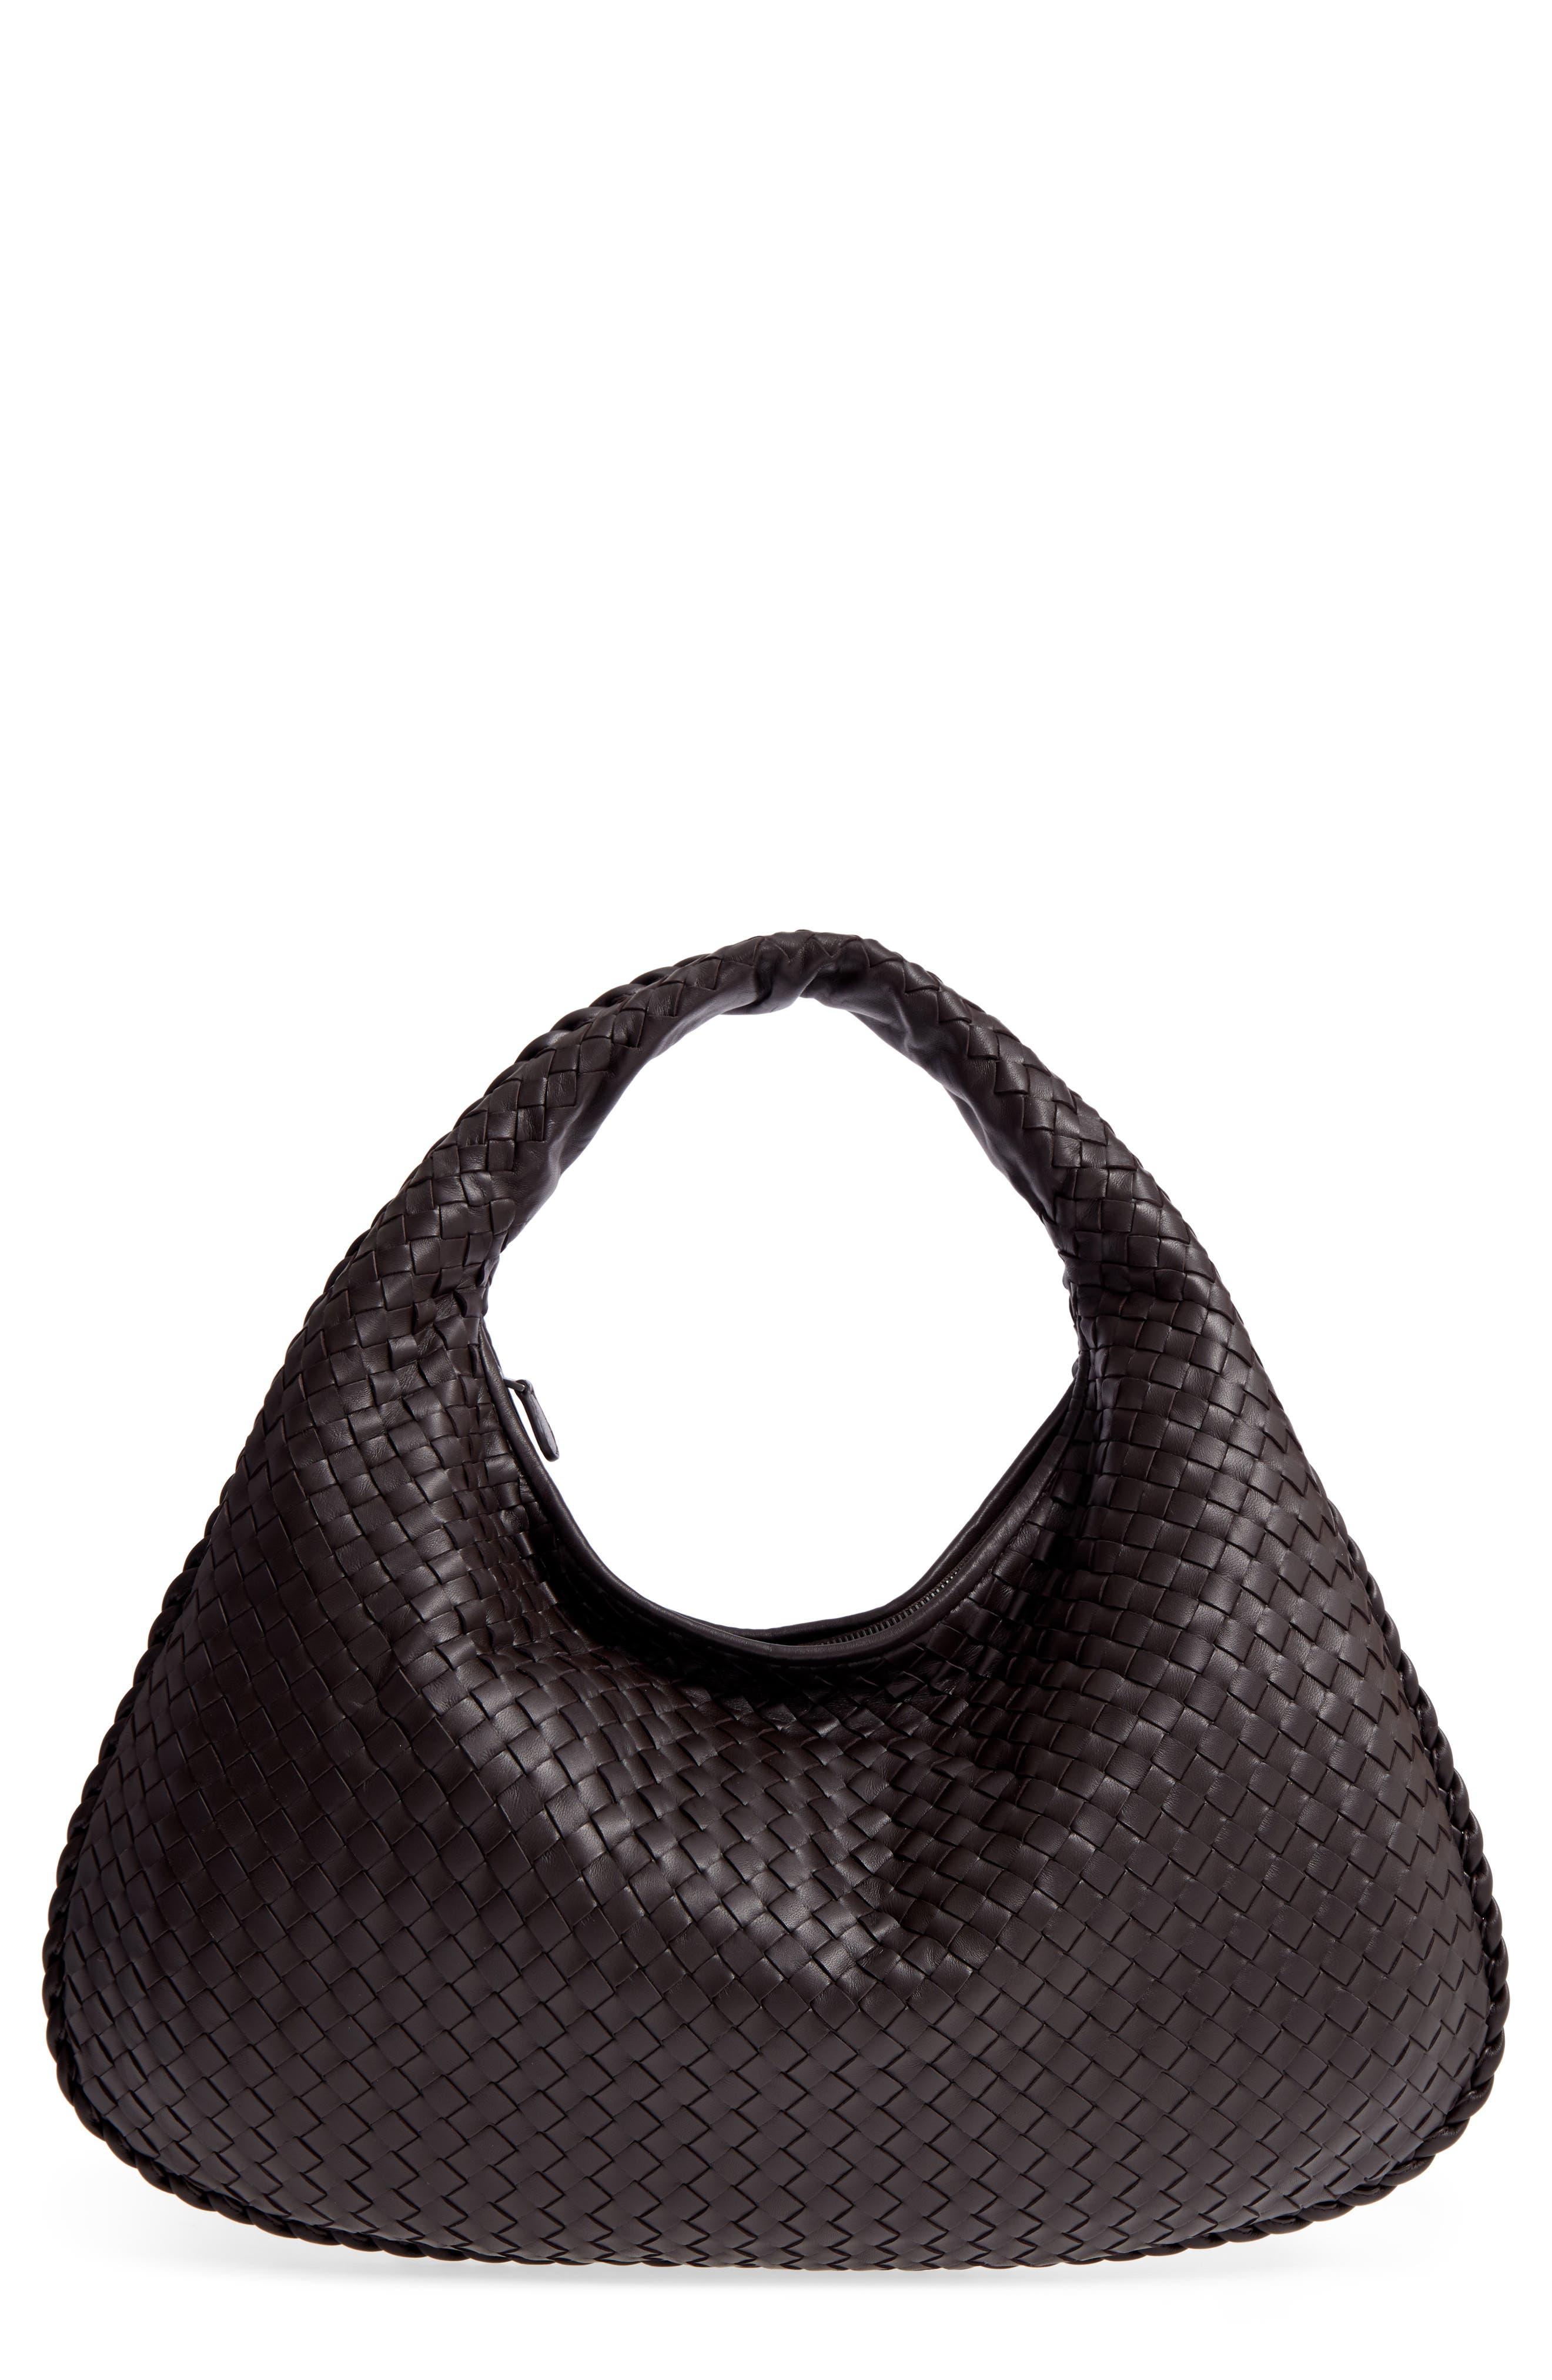 Large Veneta Leather Hobo,                             Main thumbnail 1, color,                             2074 Espresso